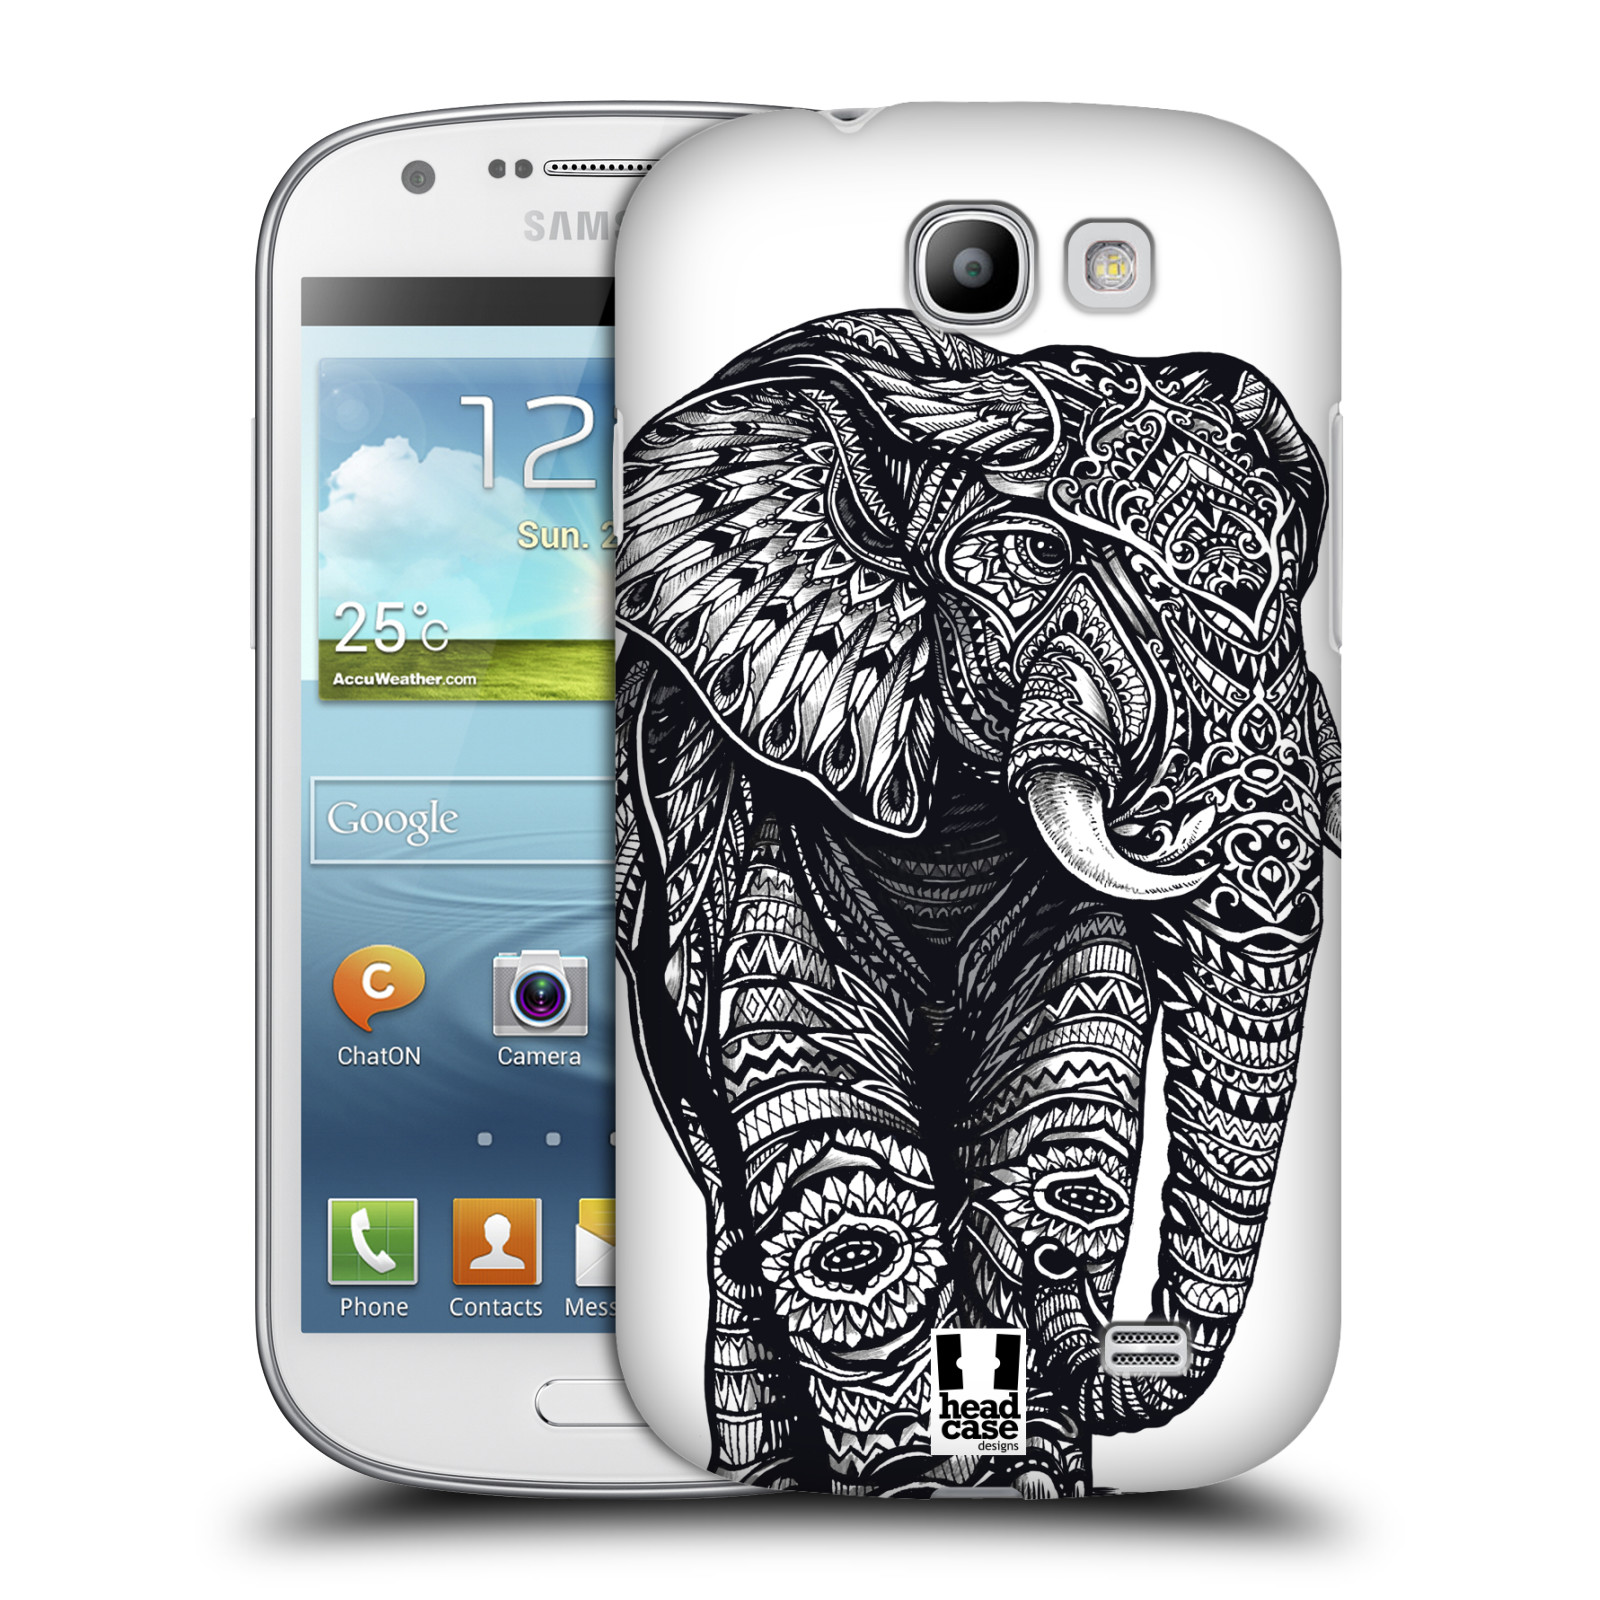 Plastové pouzdro na mobil Samsung Galaxy Express HEAD CASE Zdobený Slon (Plastový kryt či obal na mobilní telefon Samsung Galaxy Express GT-i8730)